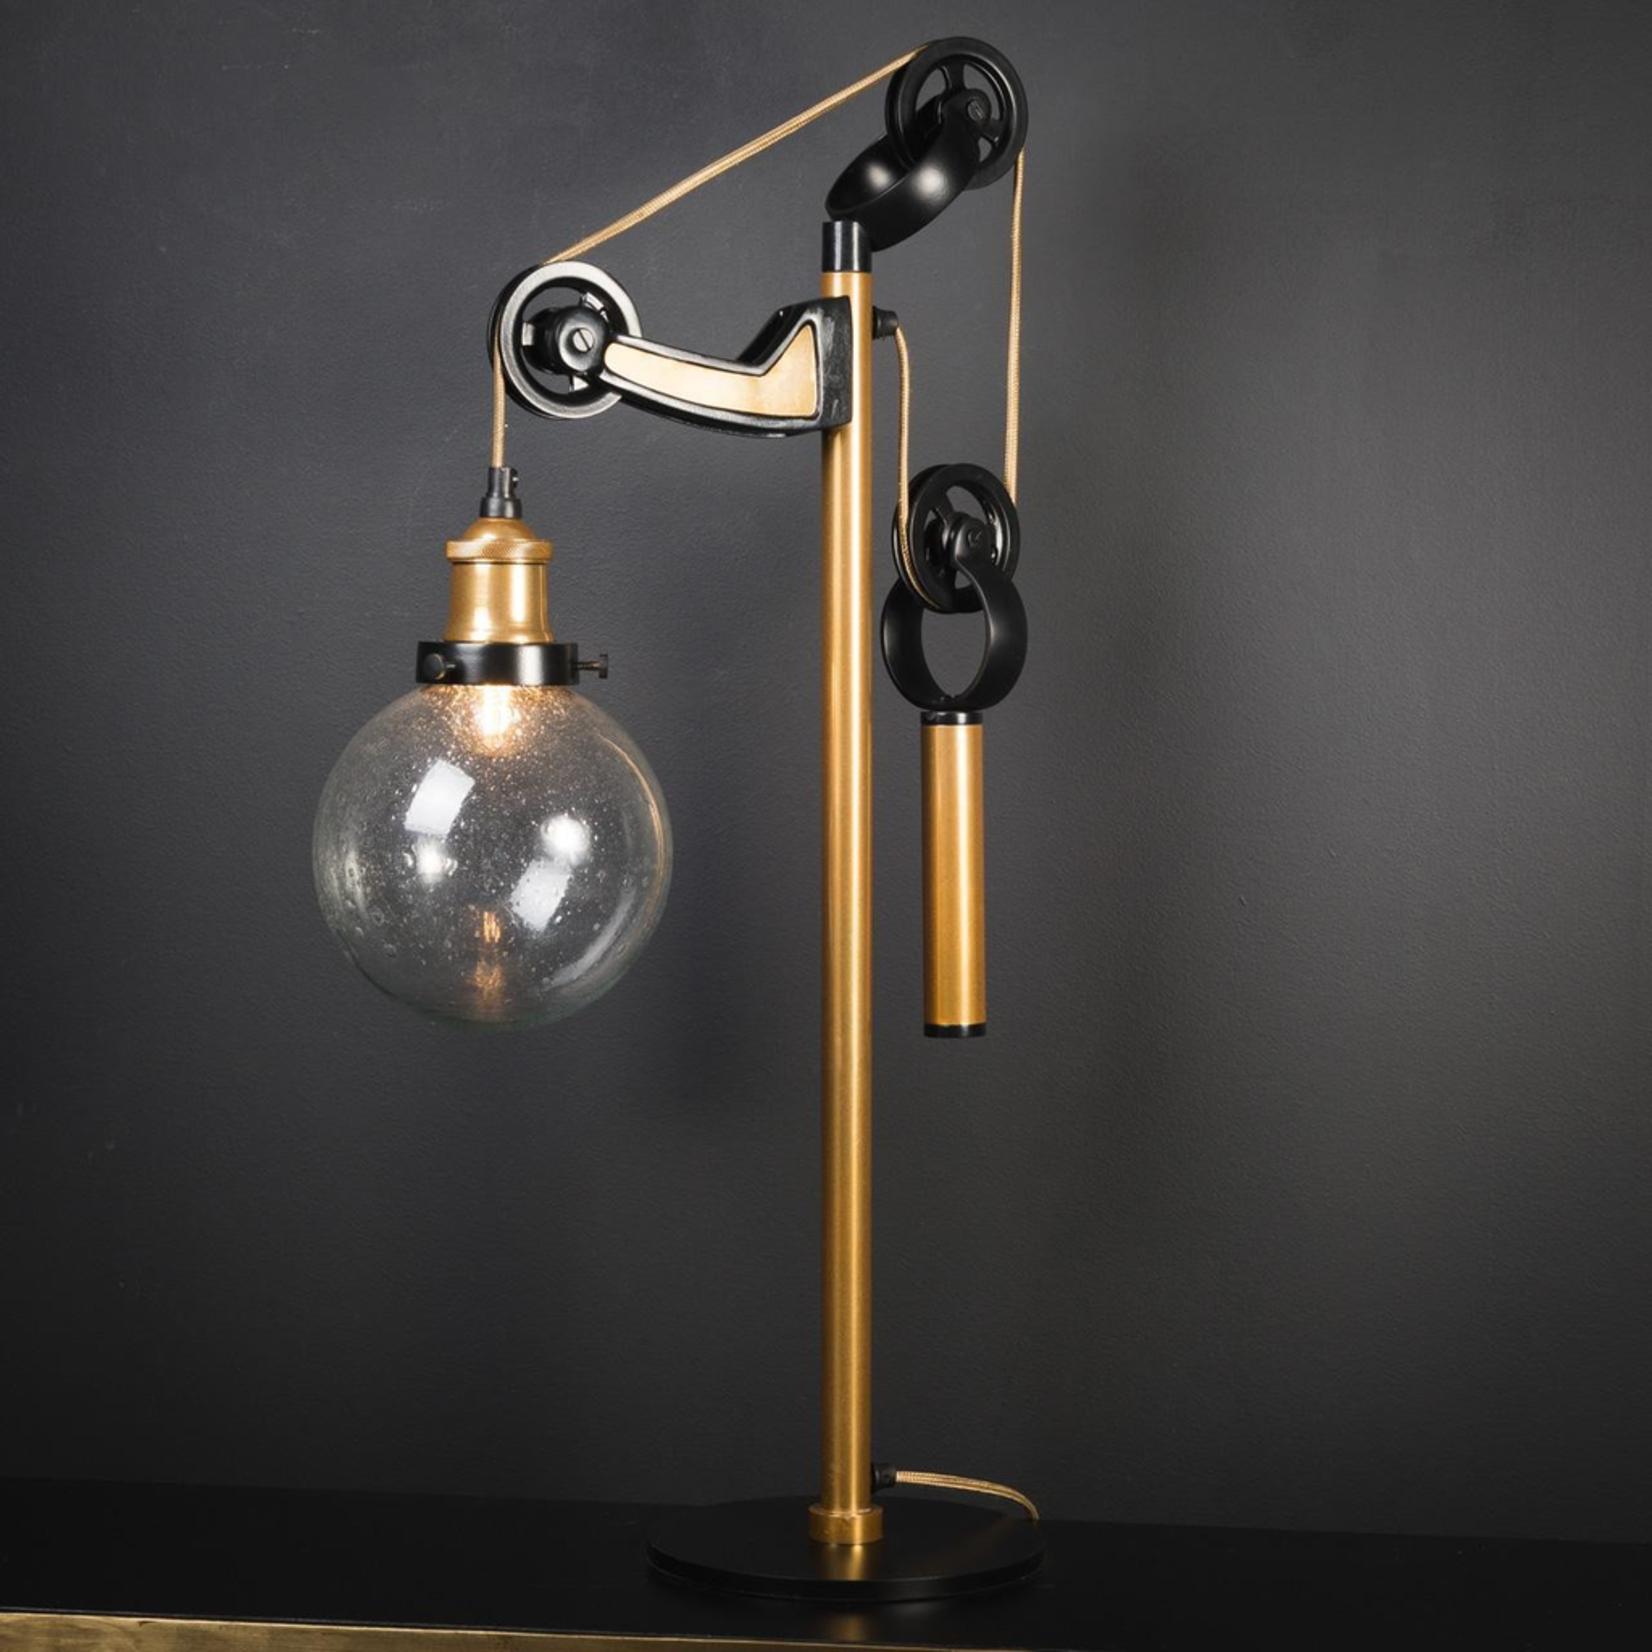 OBJET DE CURIOSITE DESK LAMP WITH COUNTERWEIGHT, BRASS AND BLACK